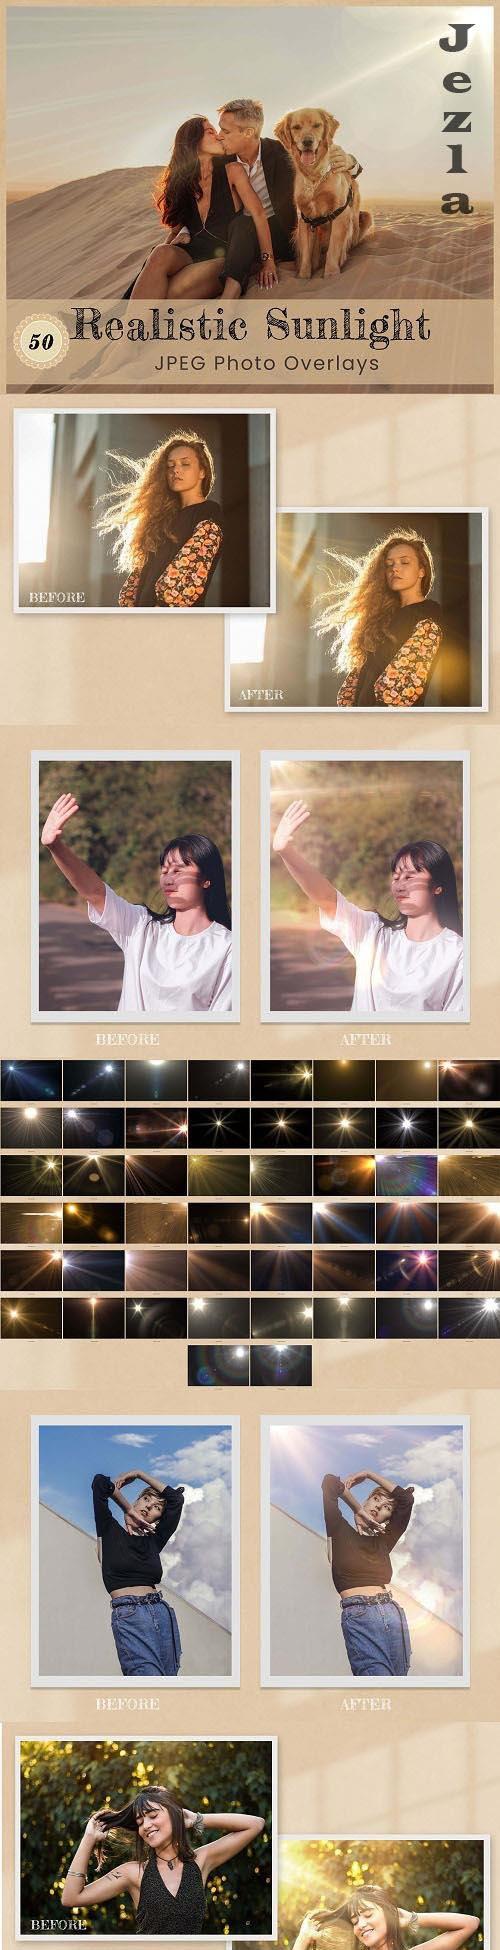 50 Realistic Sunlight Photo Overlay - 6316789